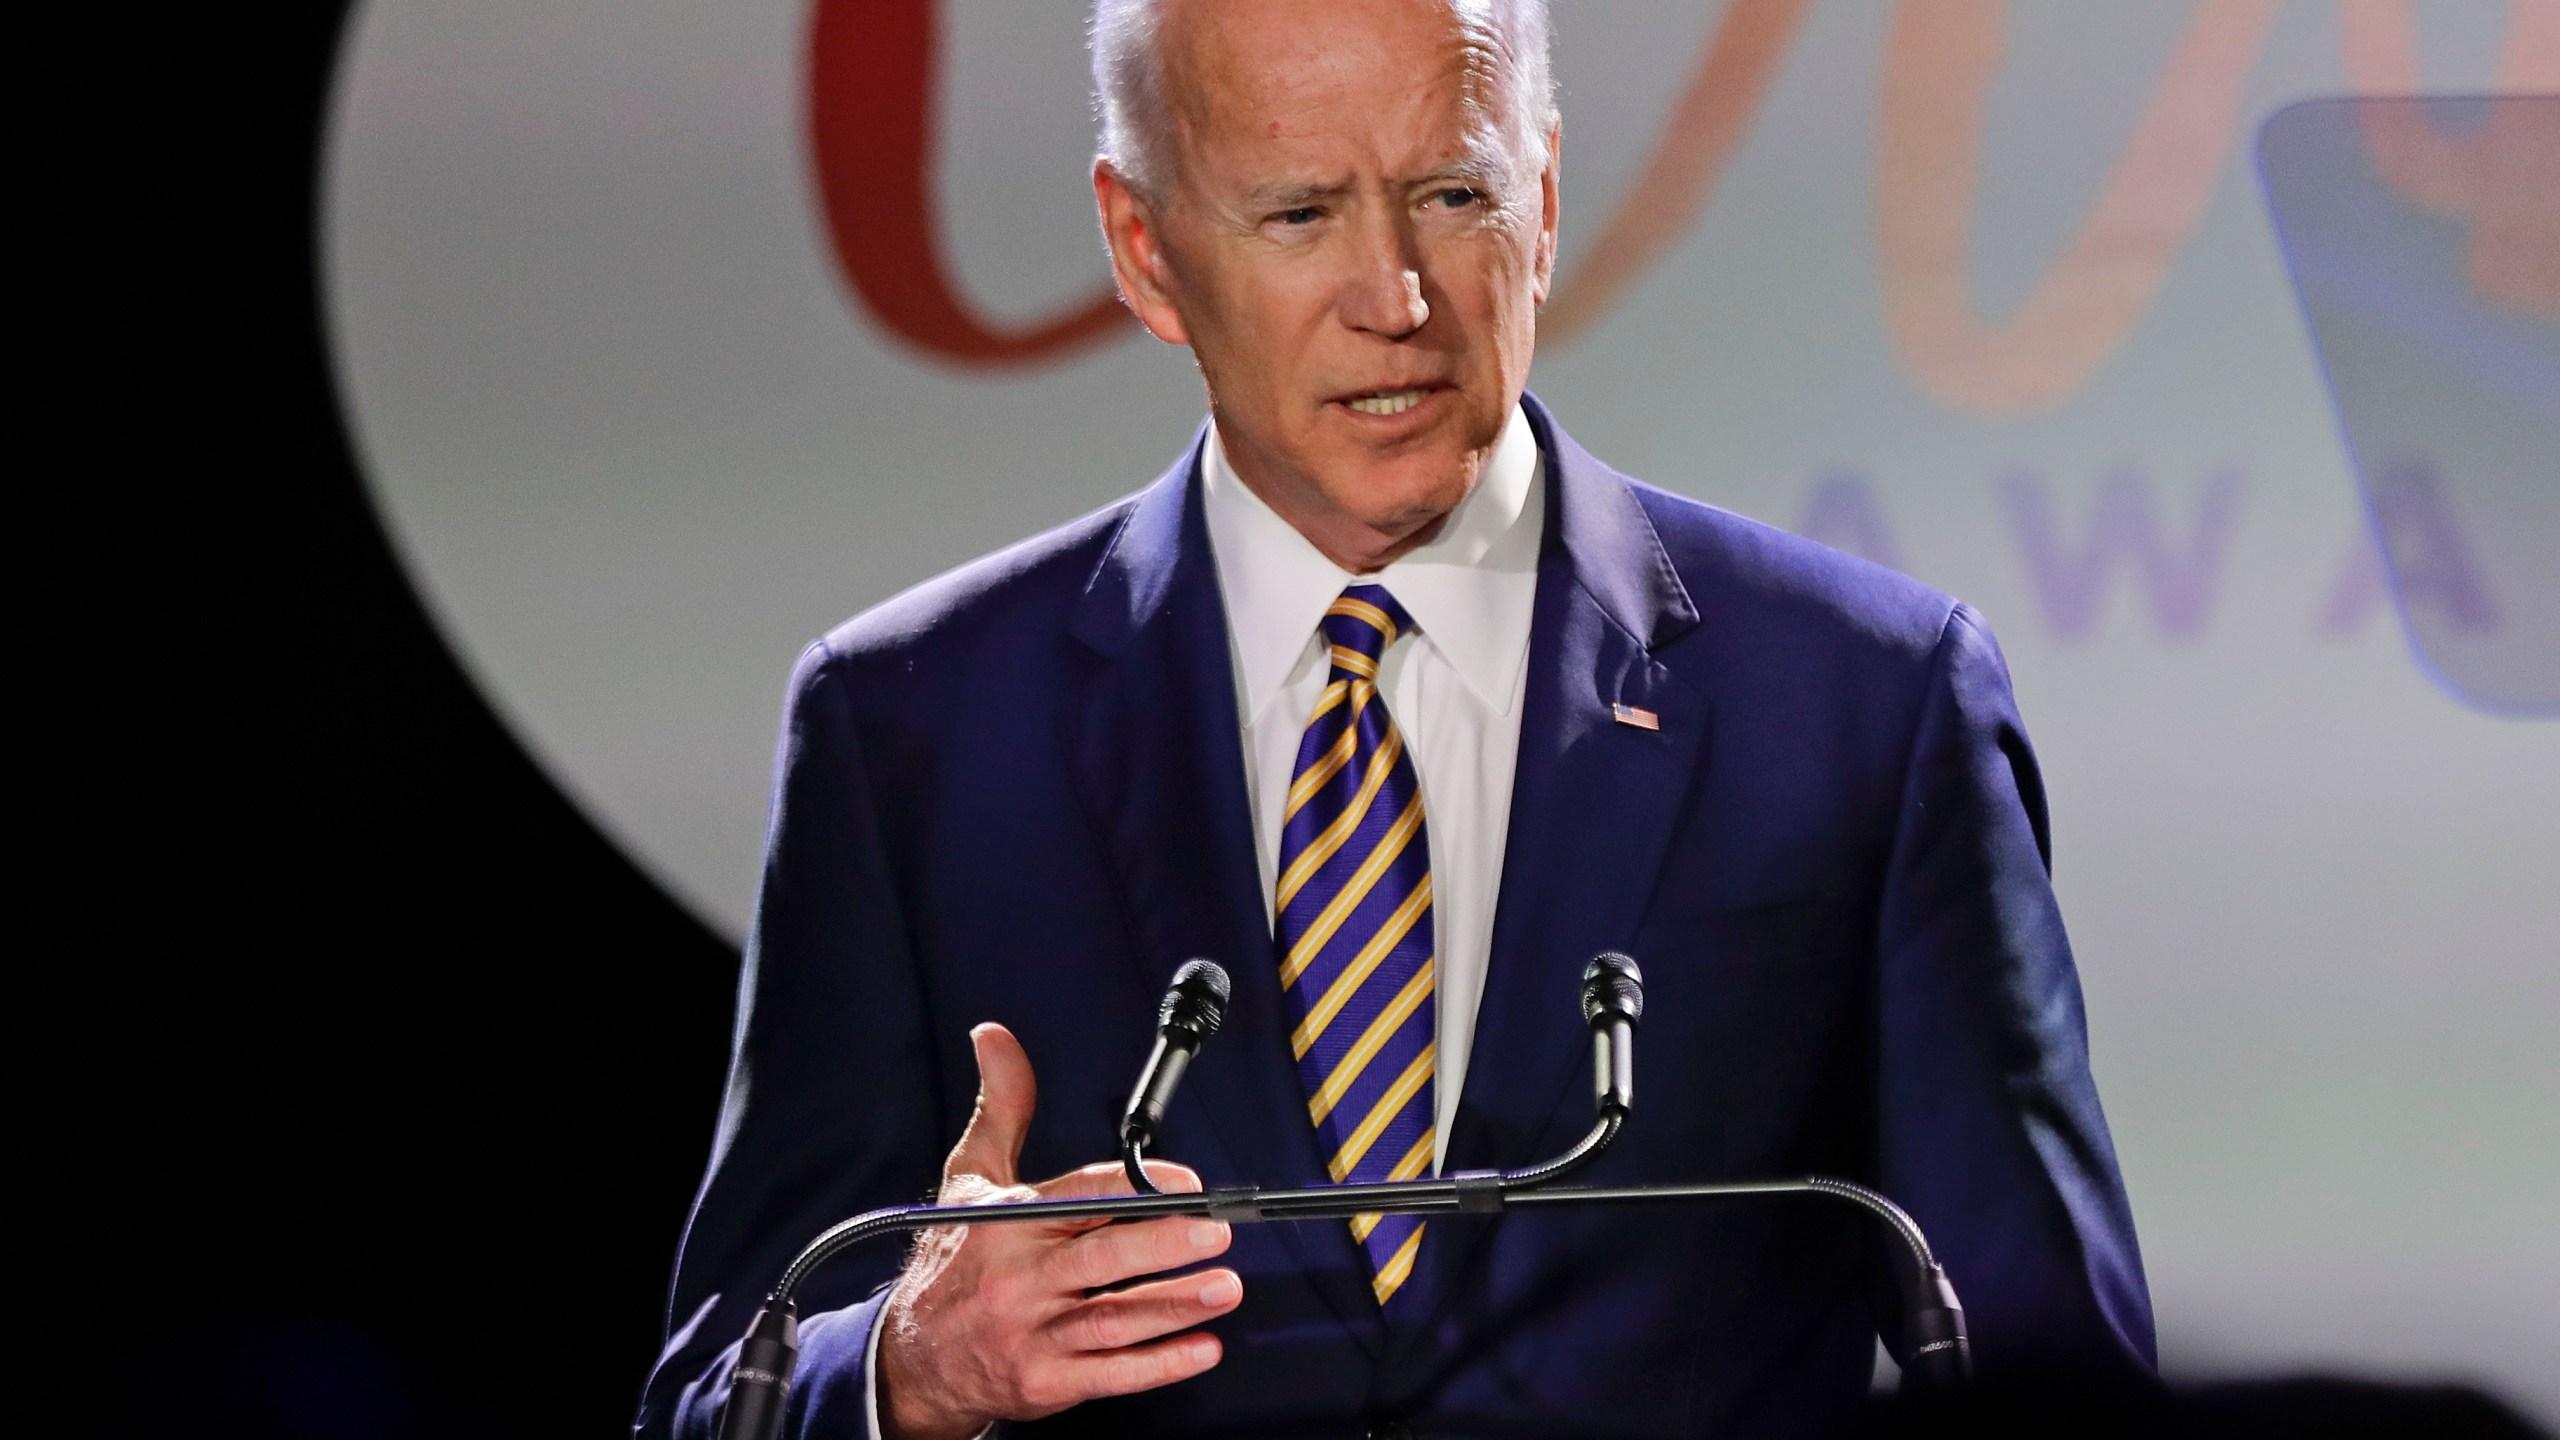 Election_2020_Joe_Biden_87877-159532.jpg22849682